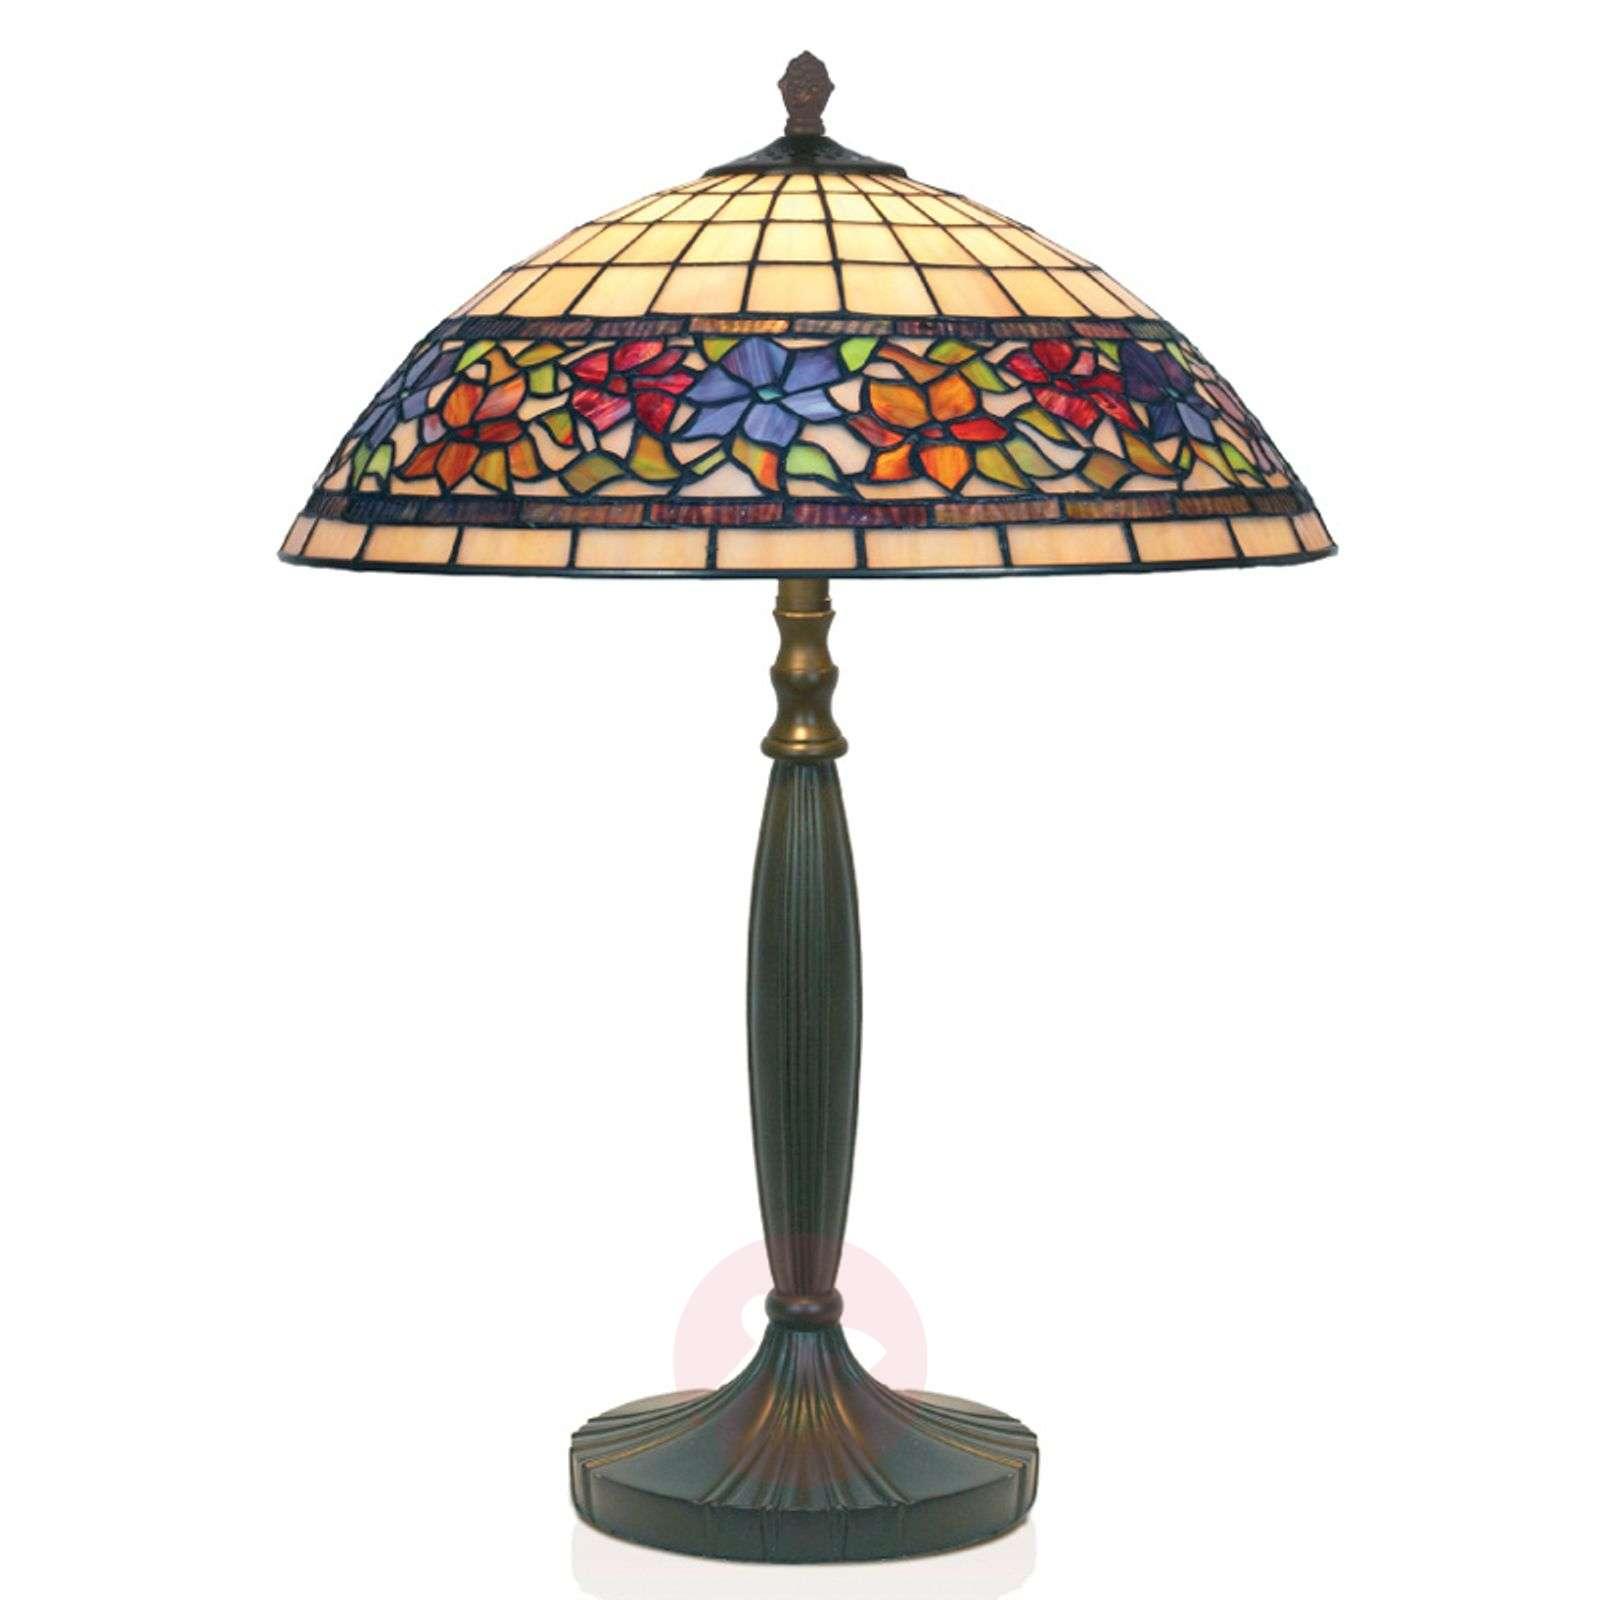 FLORA handmade Tiffany-style table lamp-1032128-01